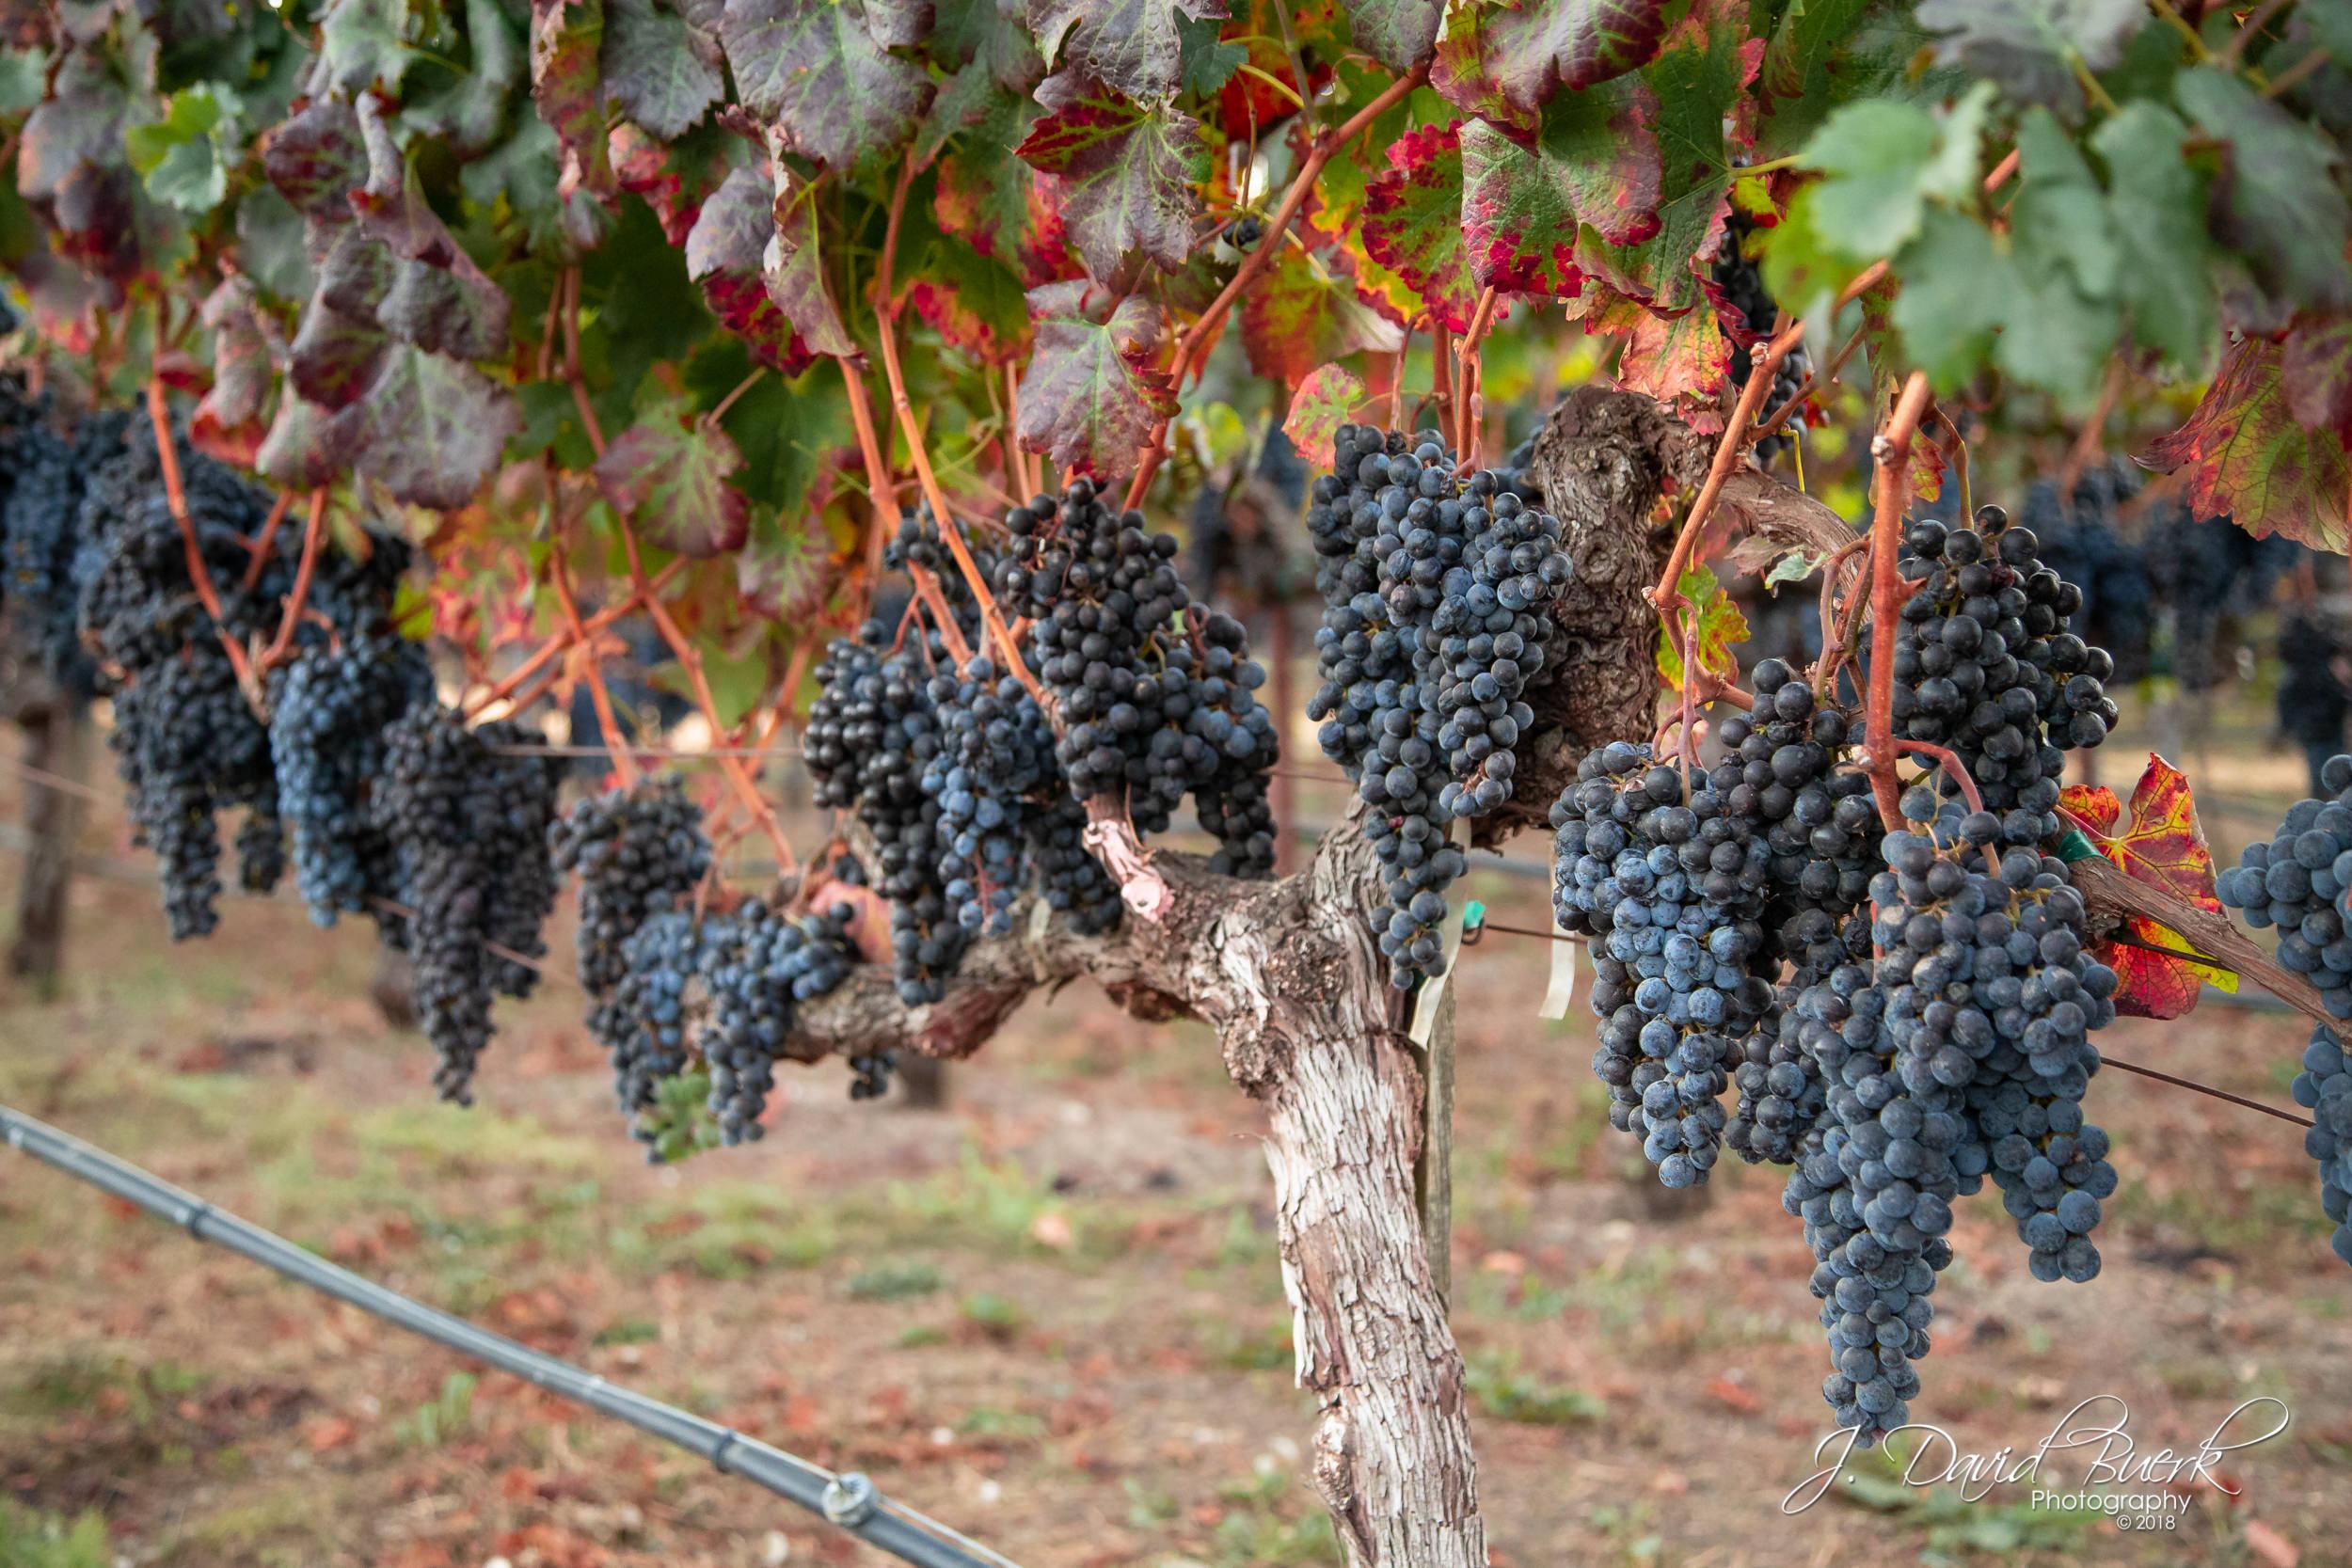 Cabernet Franc grapes on the vine in Napa, California.